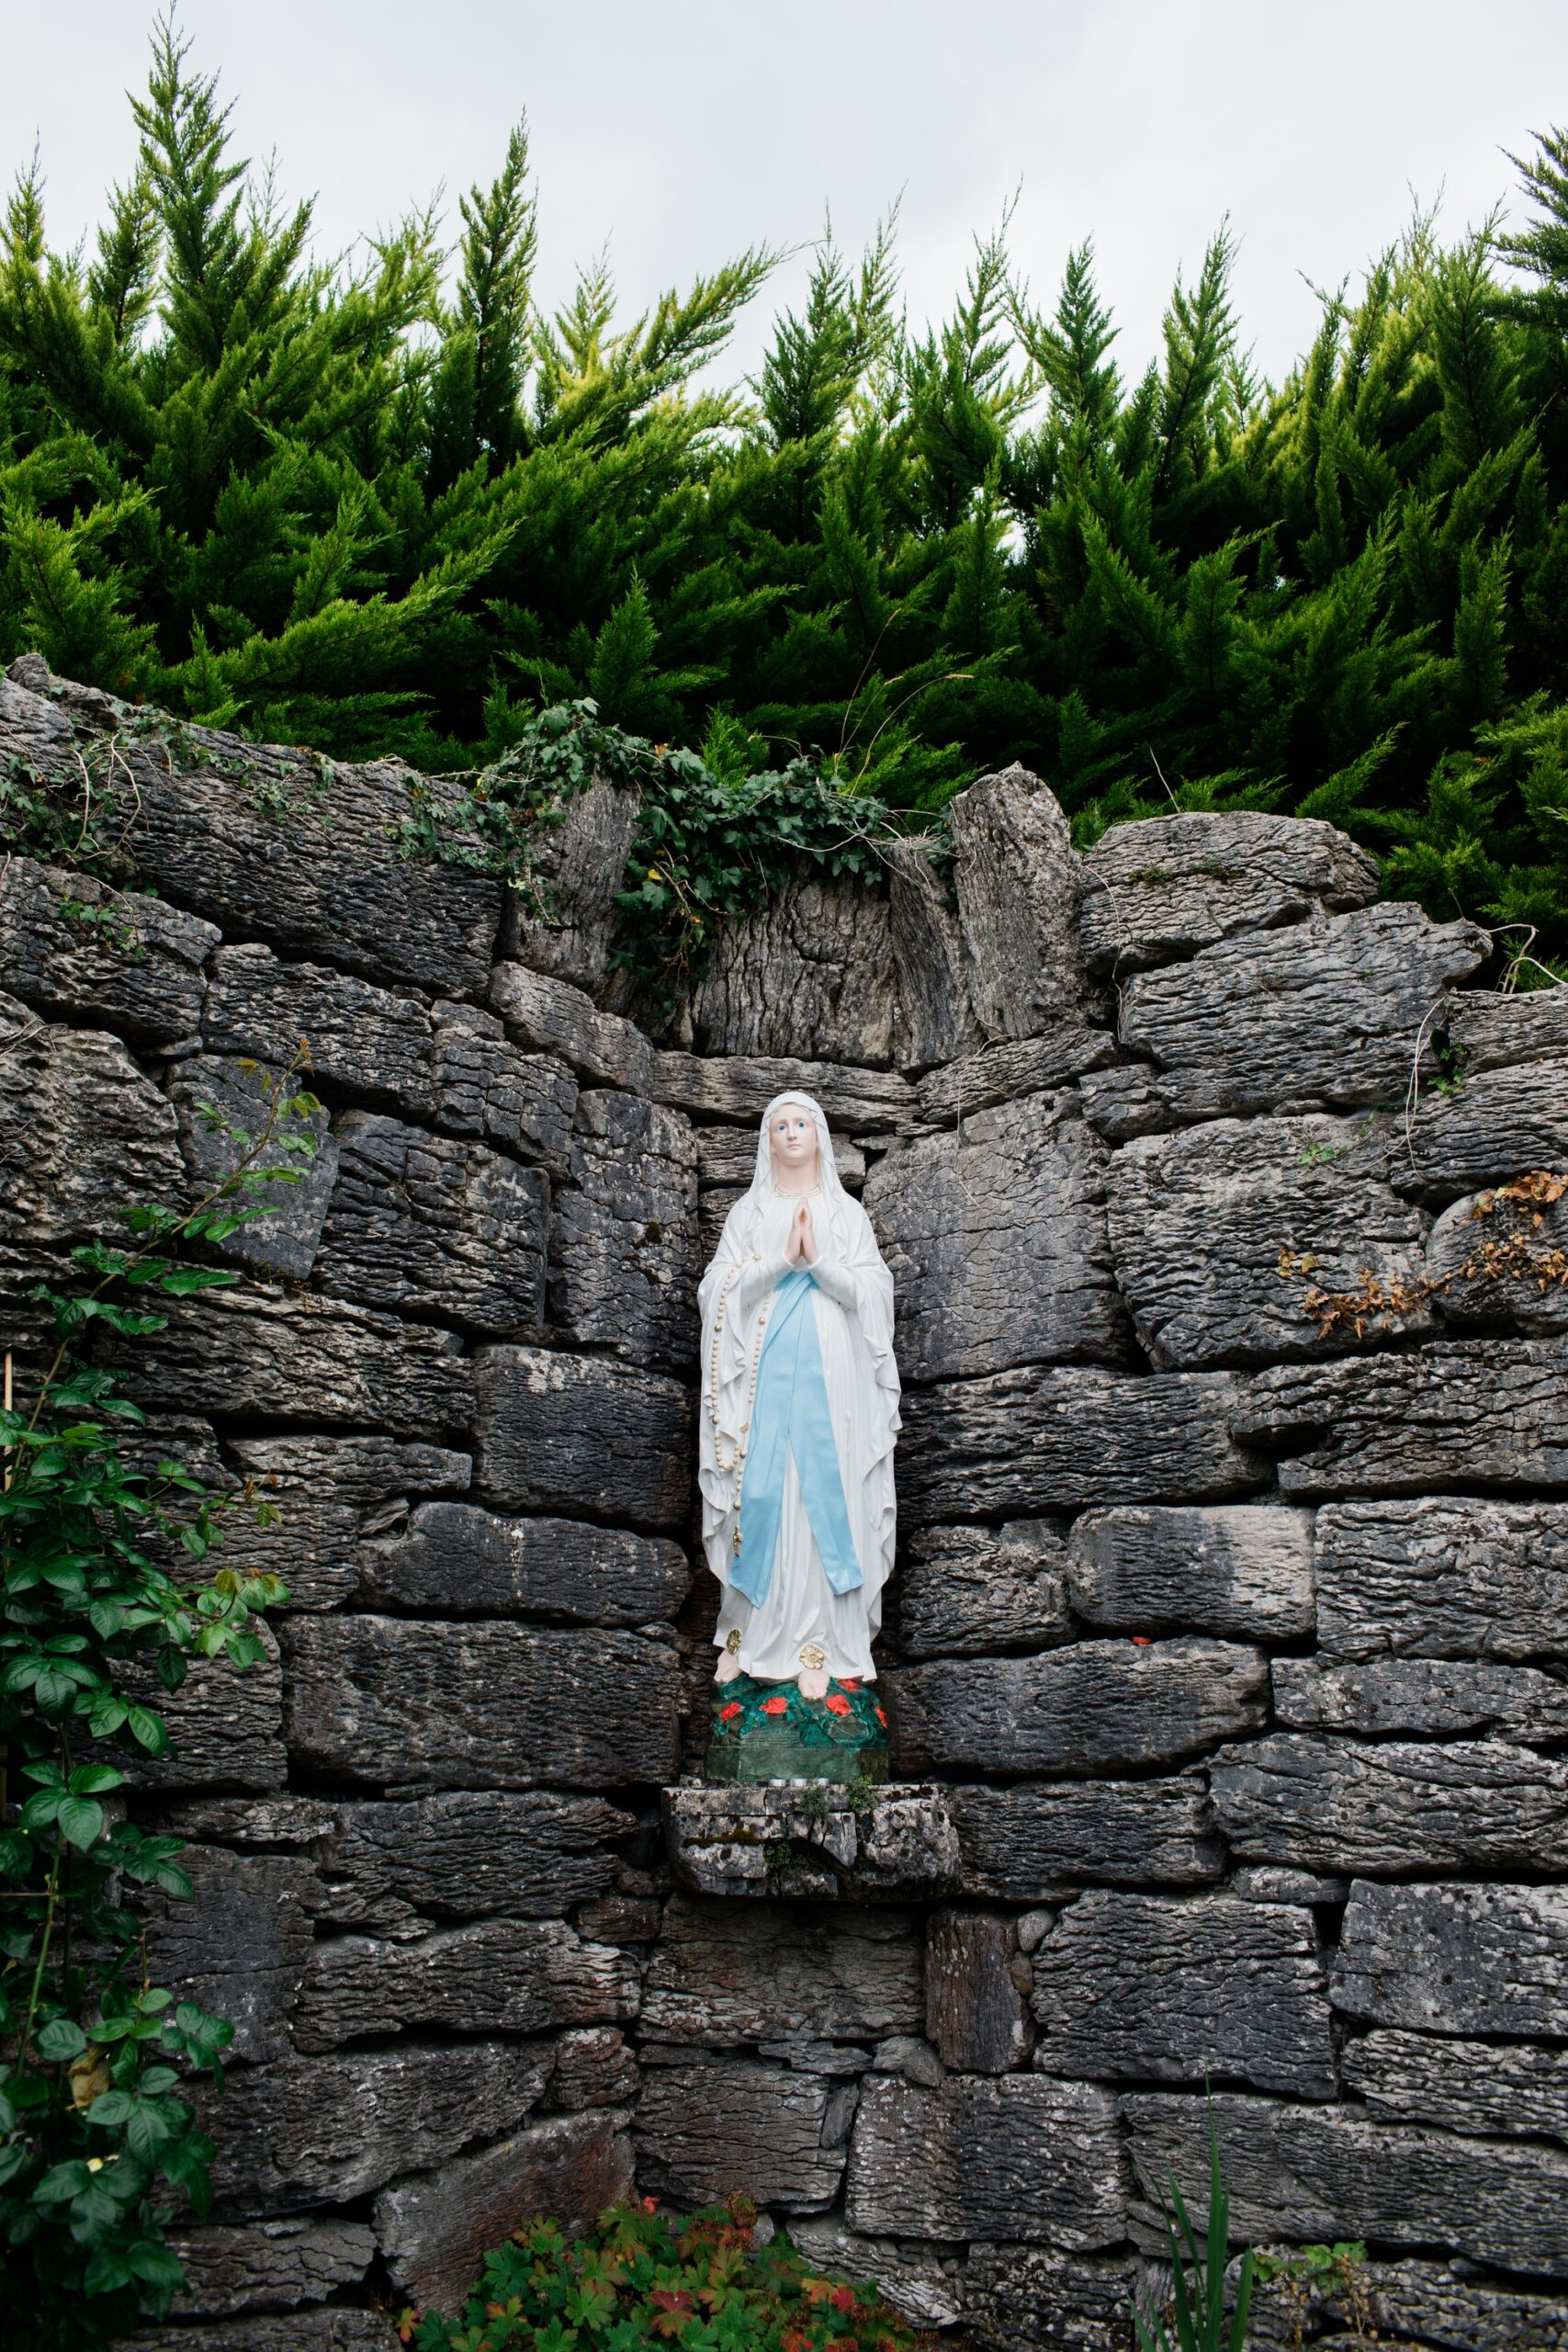 Catholic Leaders Say Pro-Choice Catholic Politicians Should Not Receive Communion